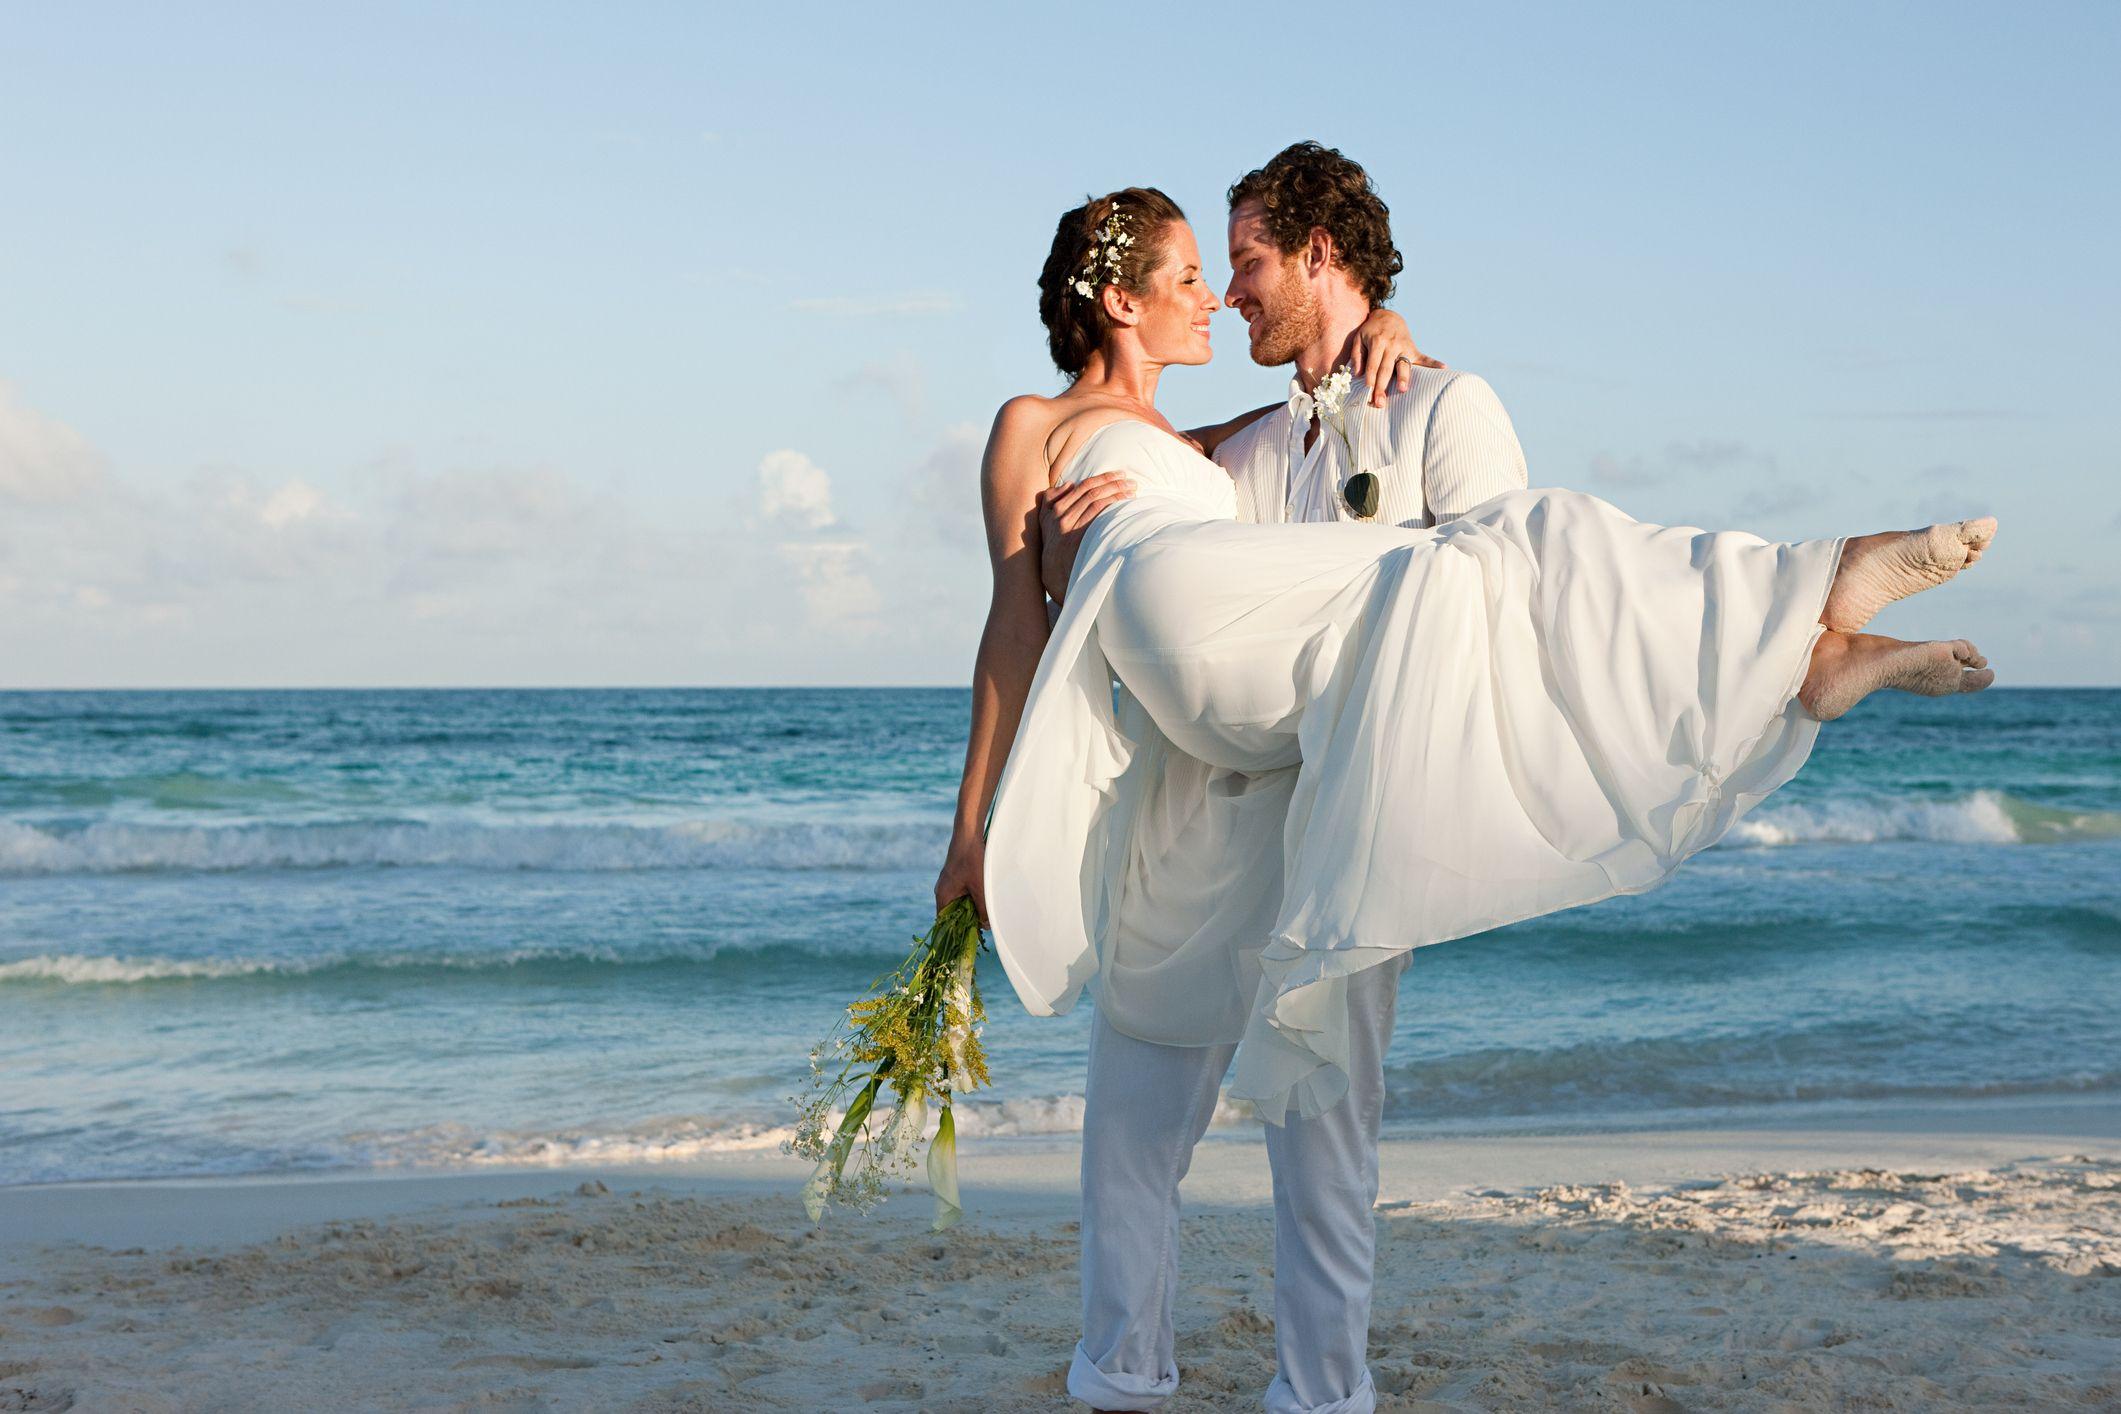 Men Reveal Their Ultimate Dream Wedding